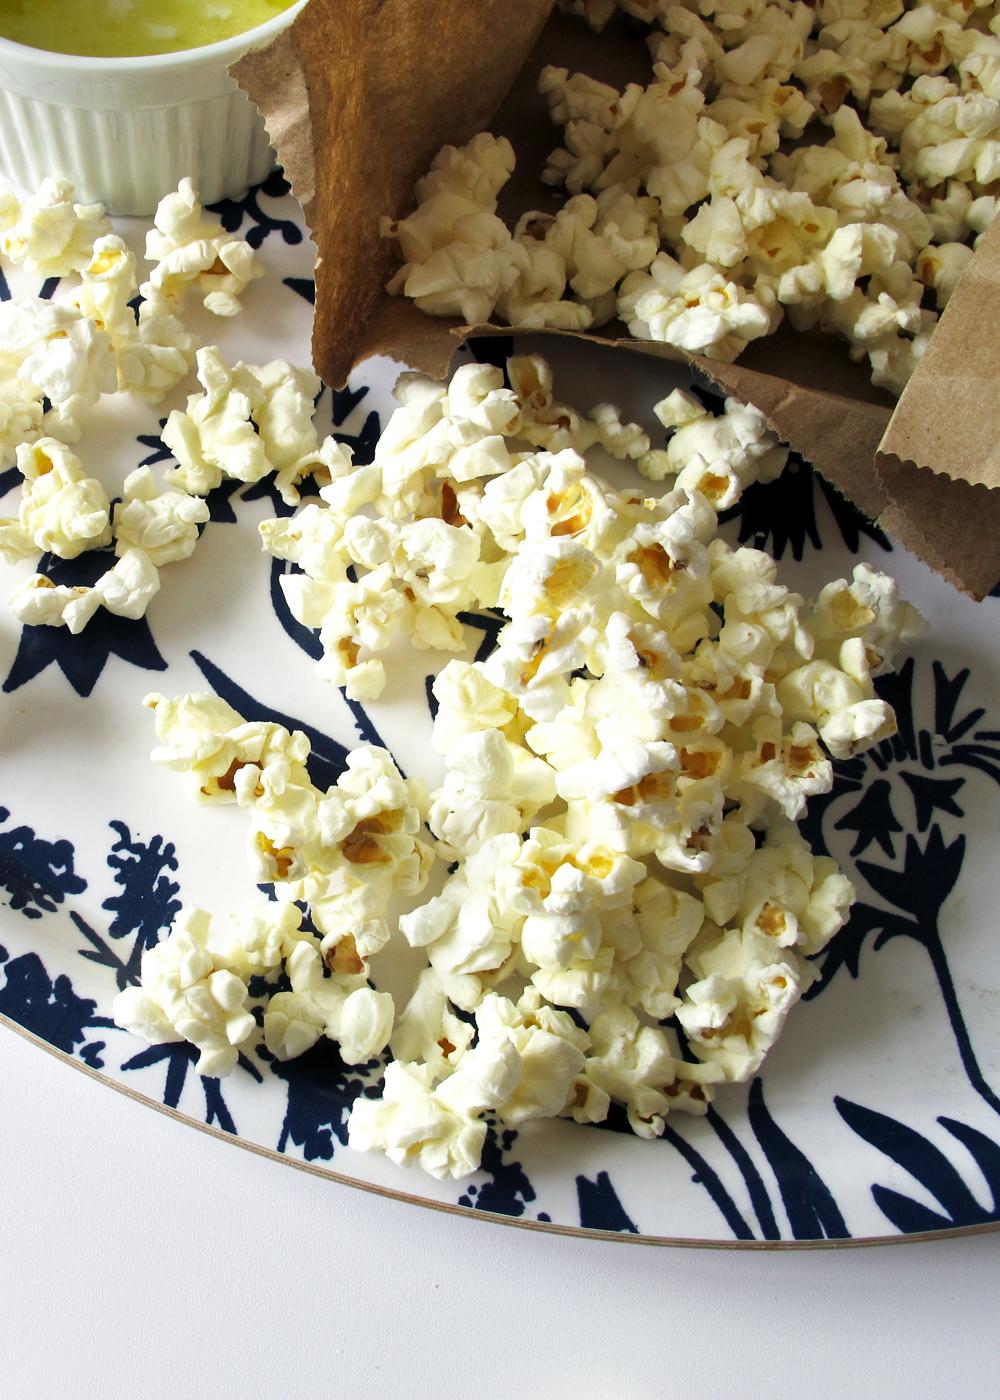 natural microwave popcorn recipe